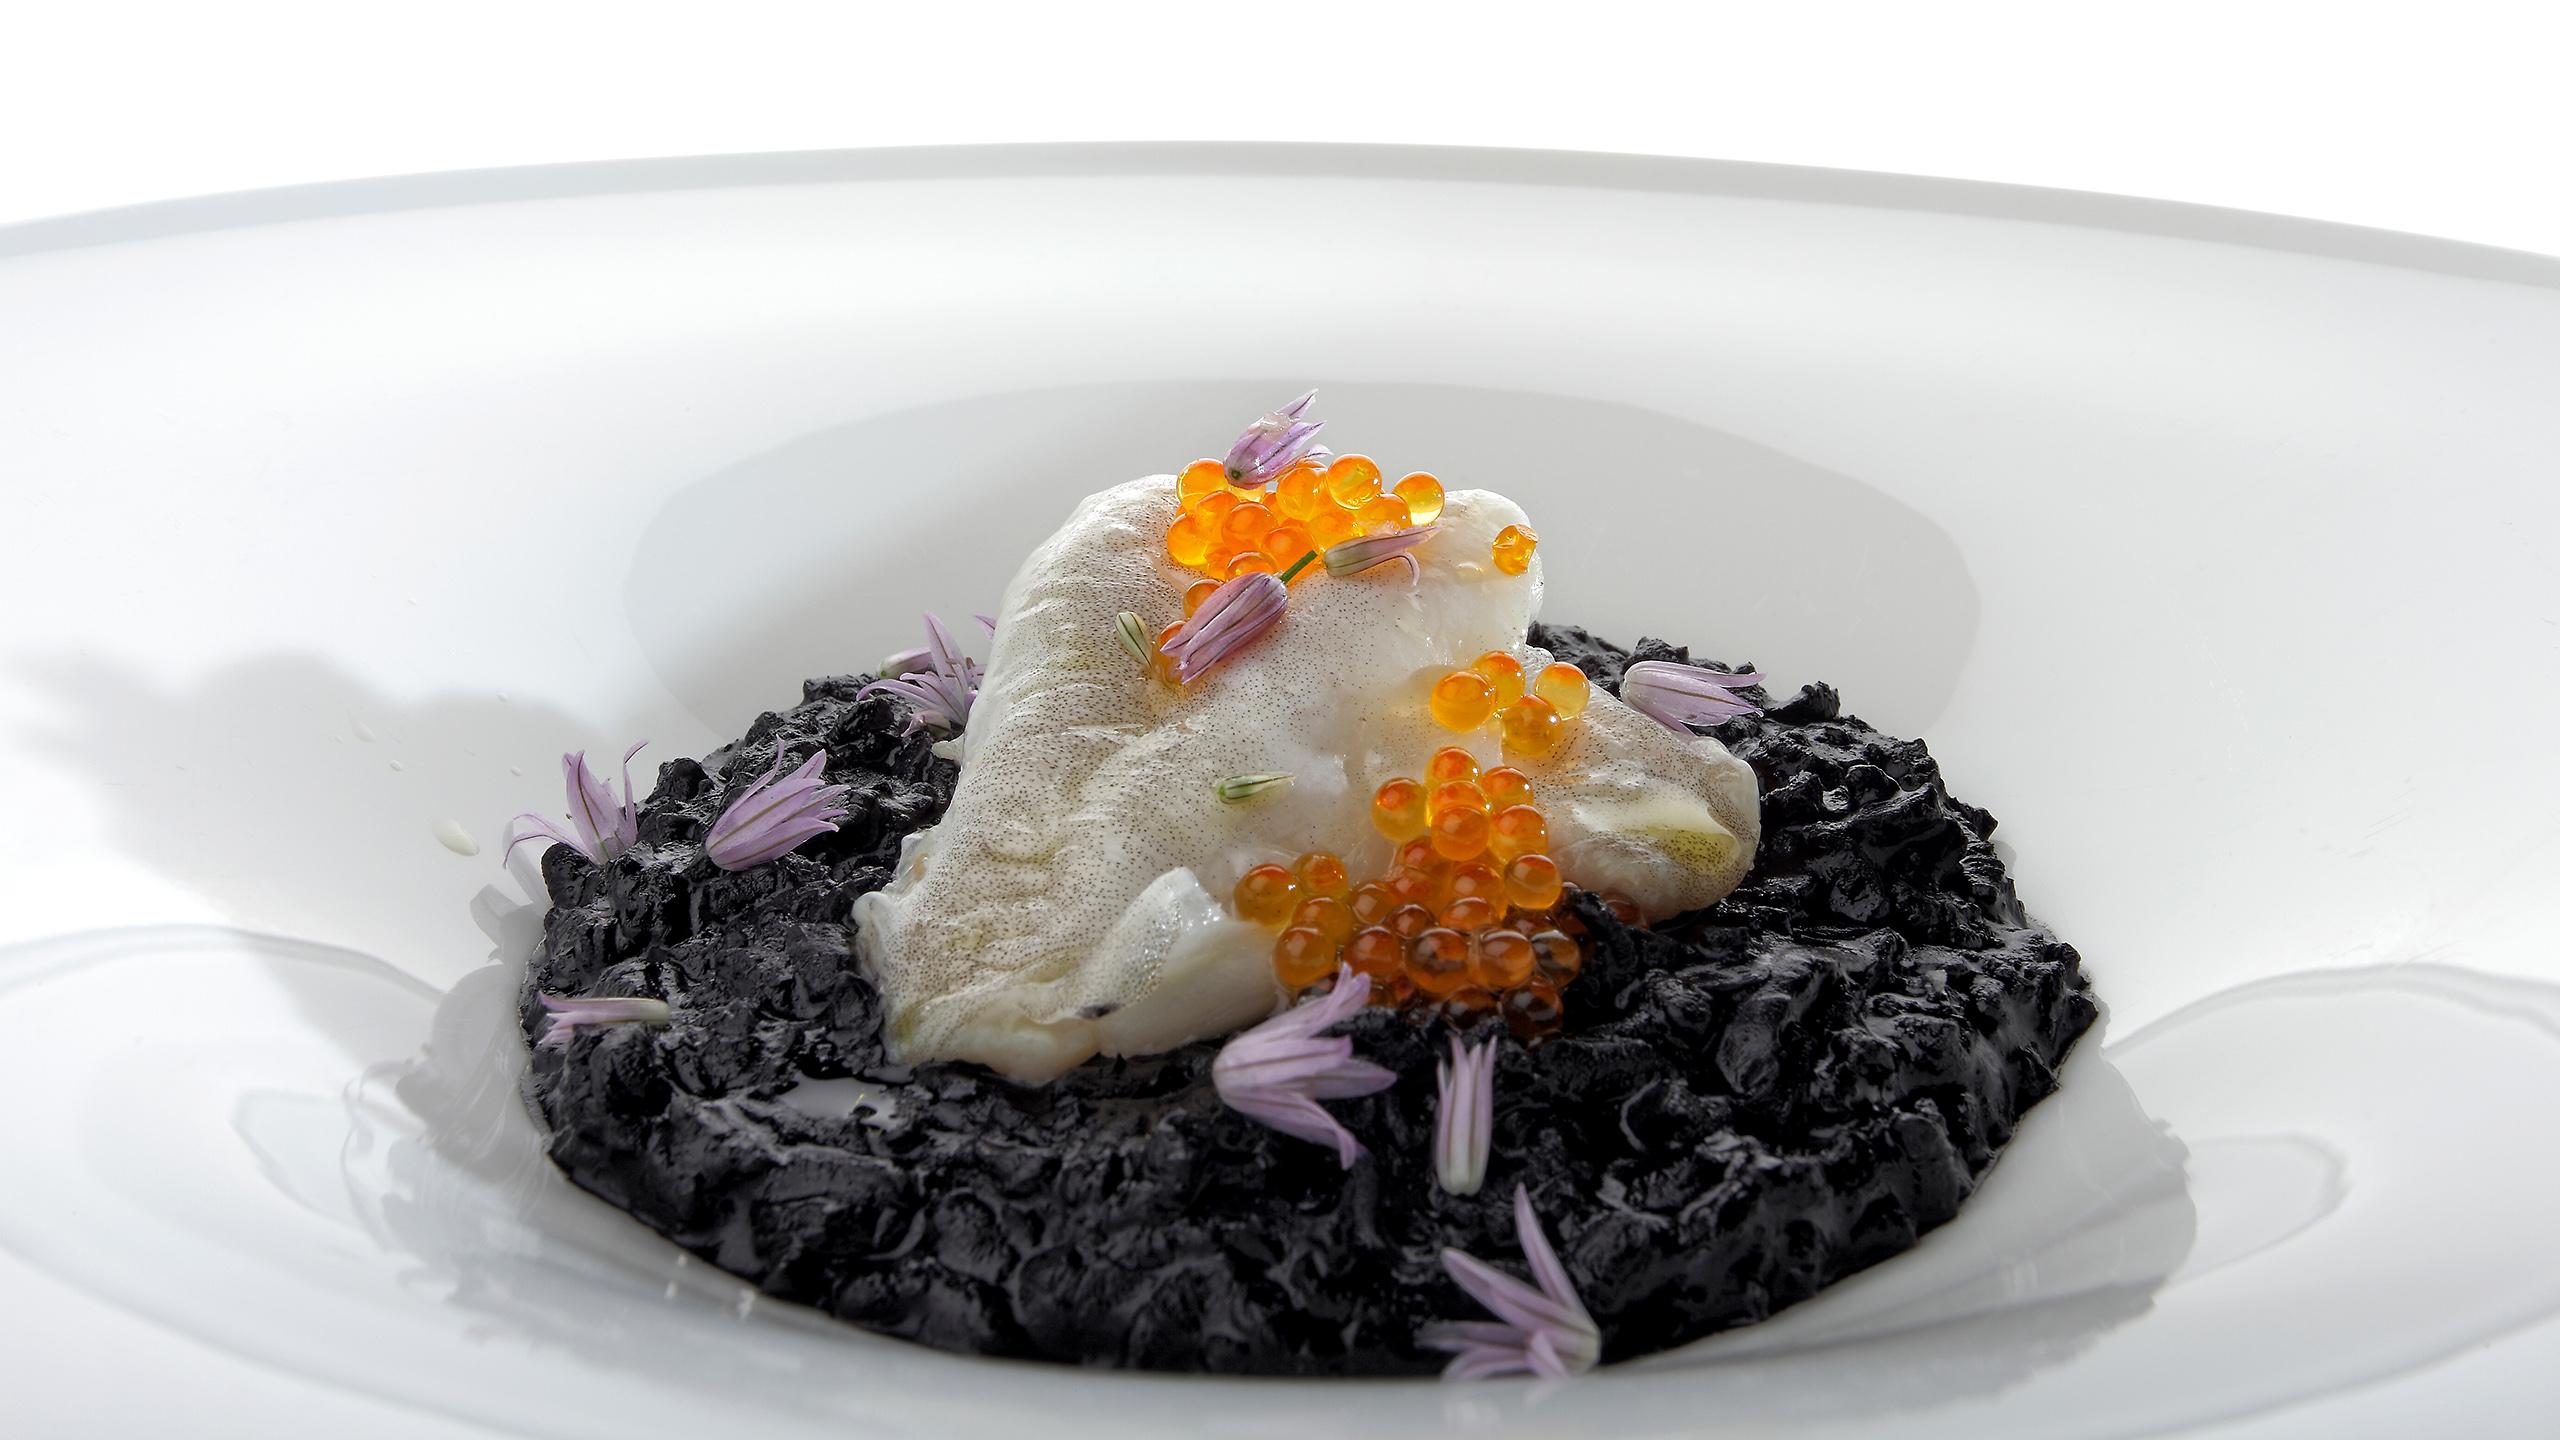 gastronomia 11 tafona